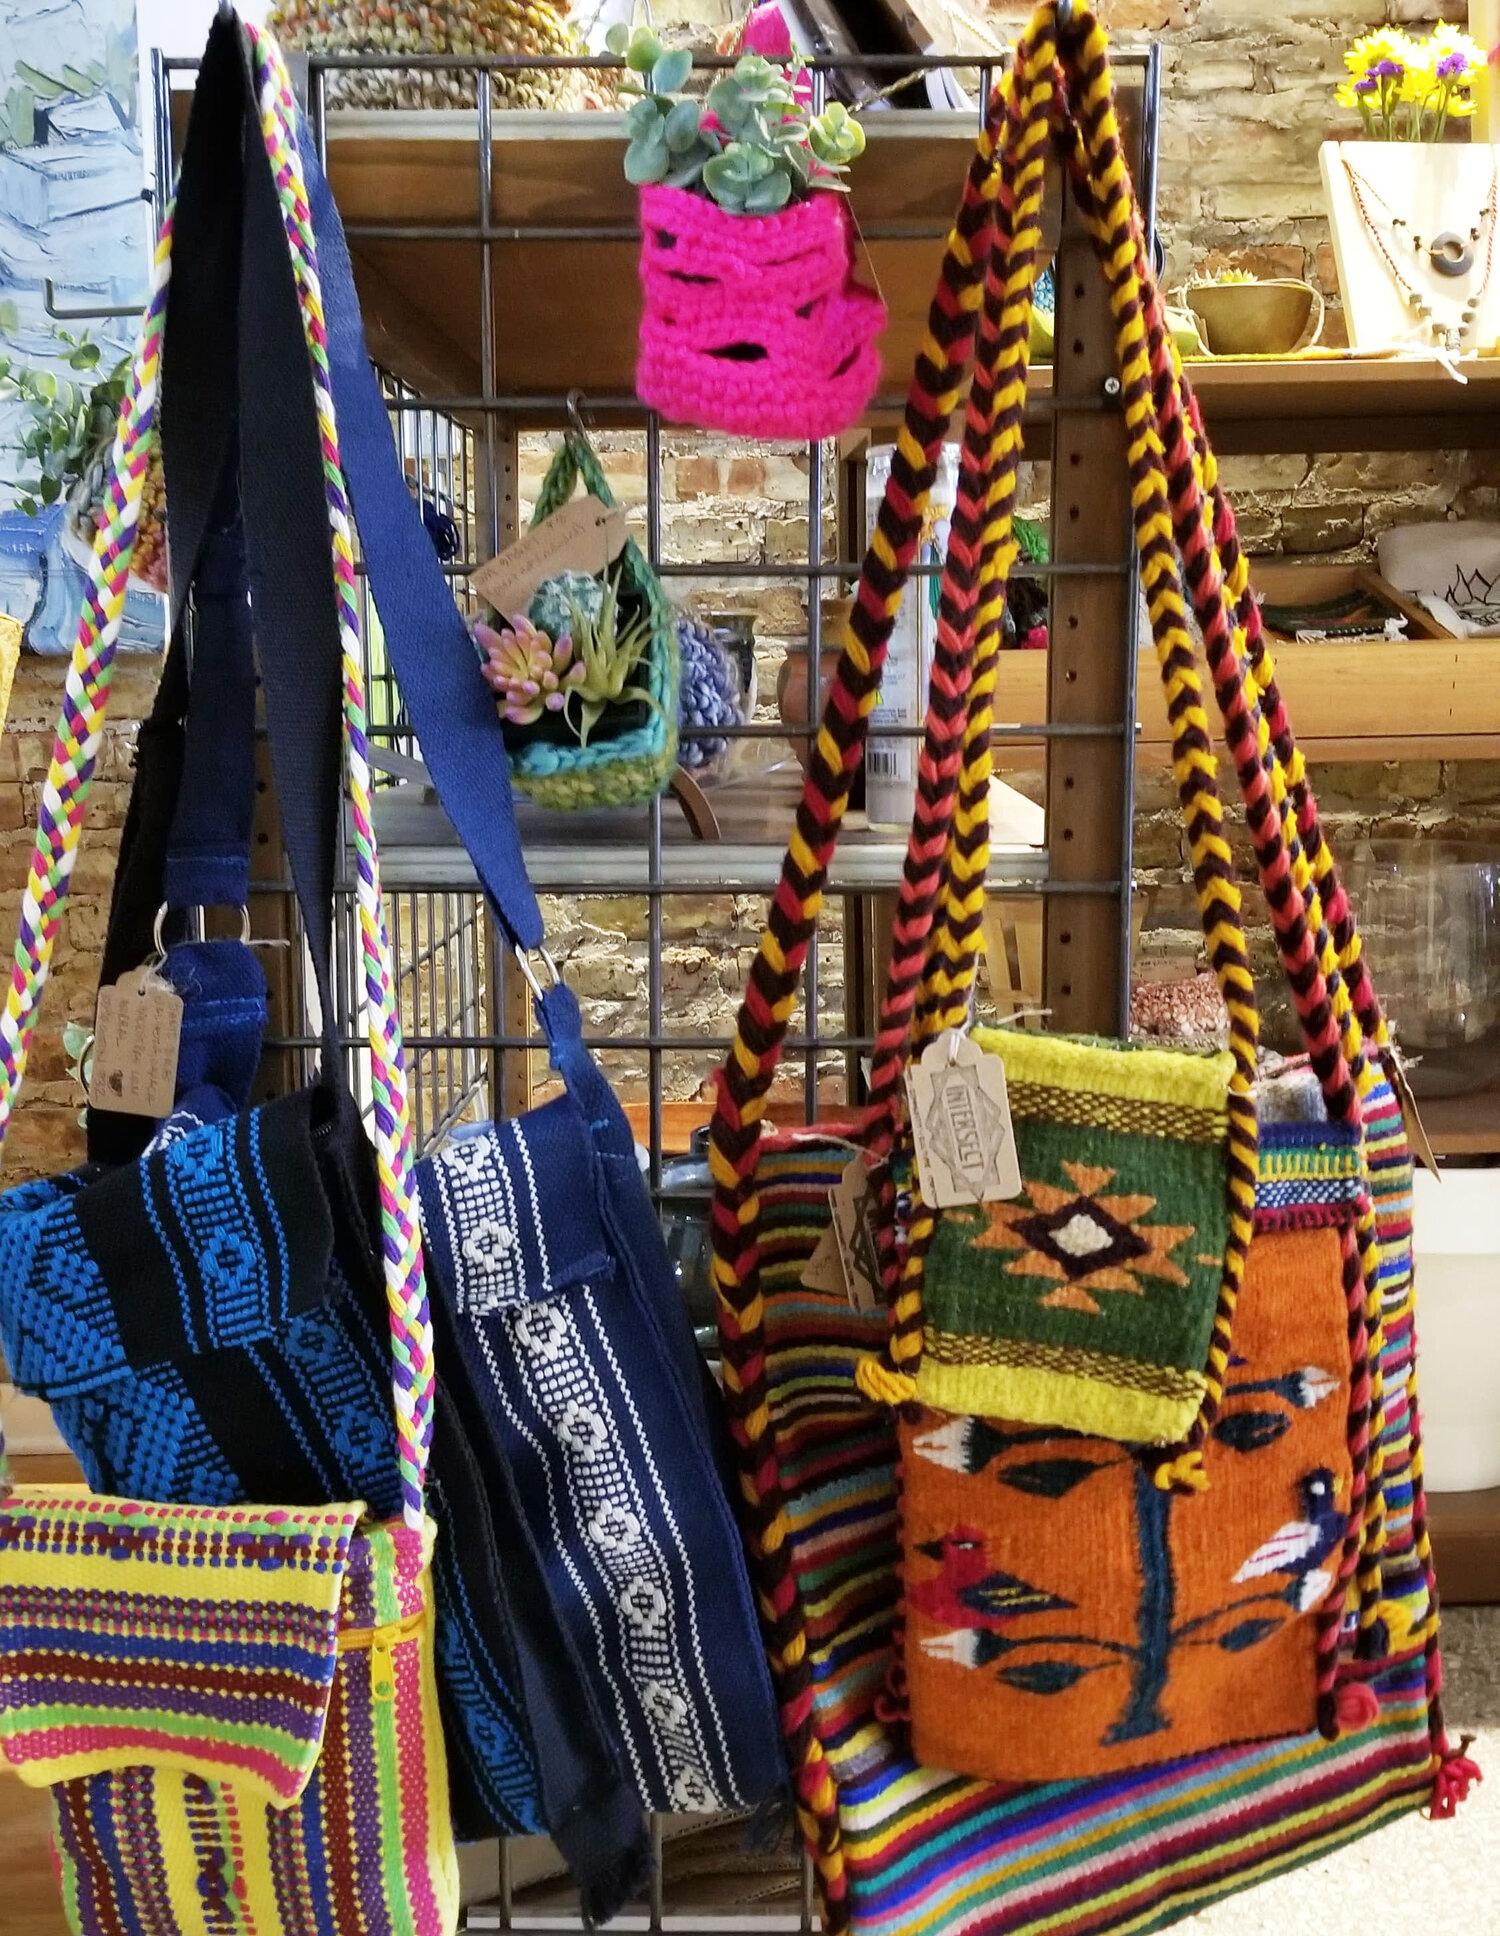 Handwoven textiles from Teotlitán del Valle and Santo Tomás Jalieza, Oaxaca